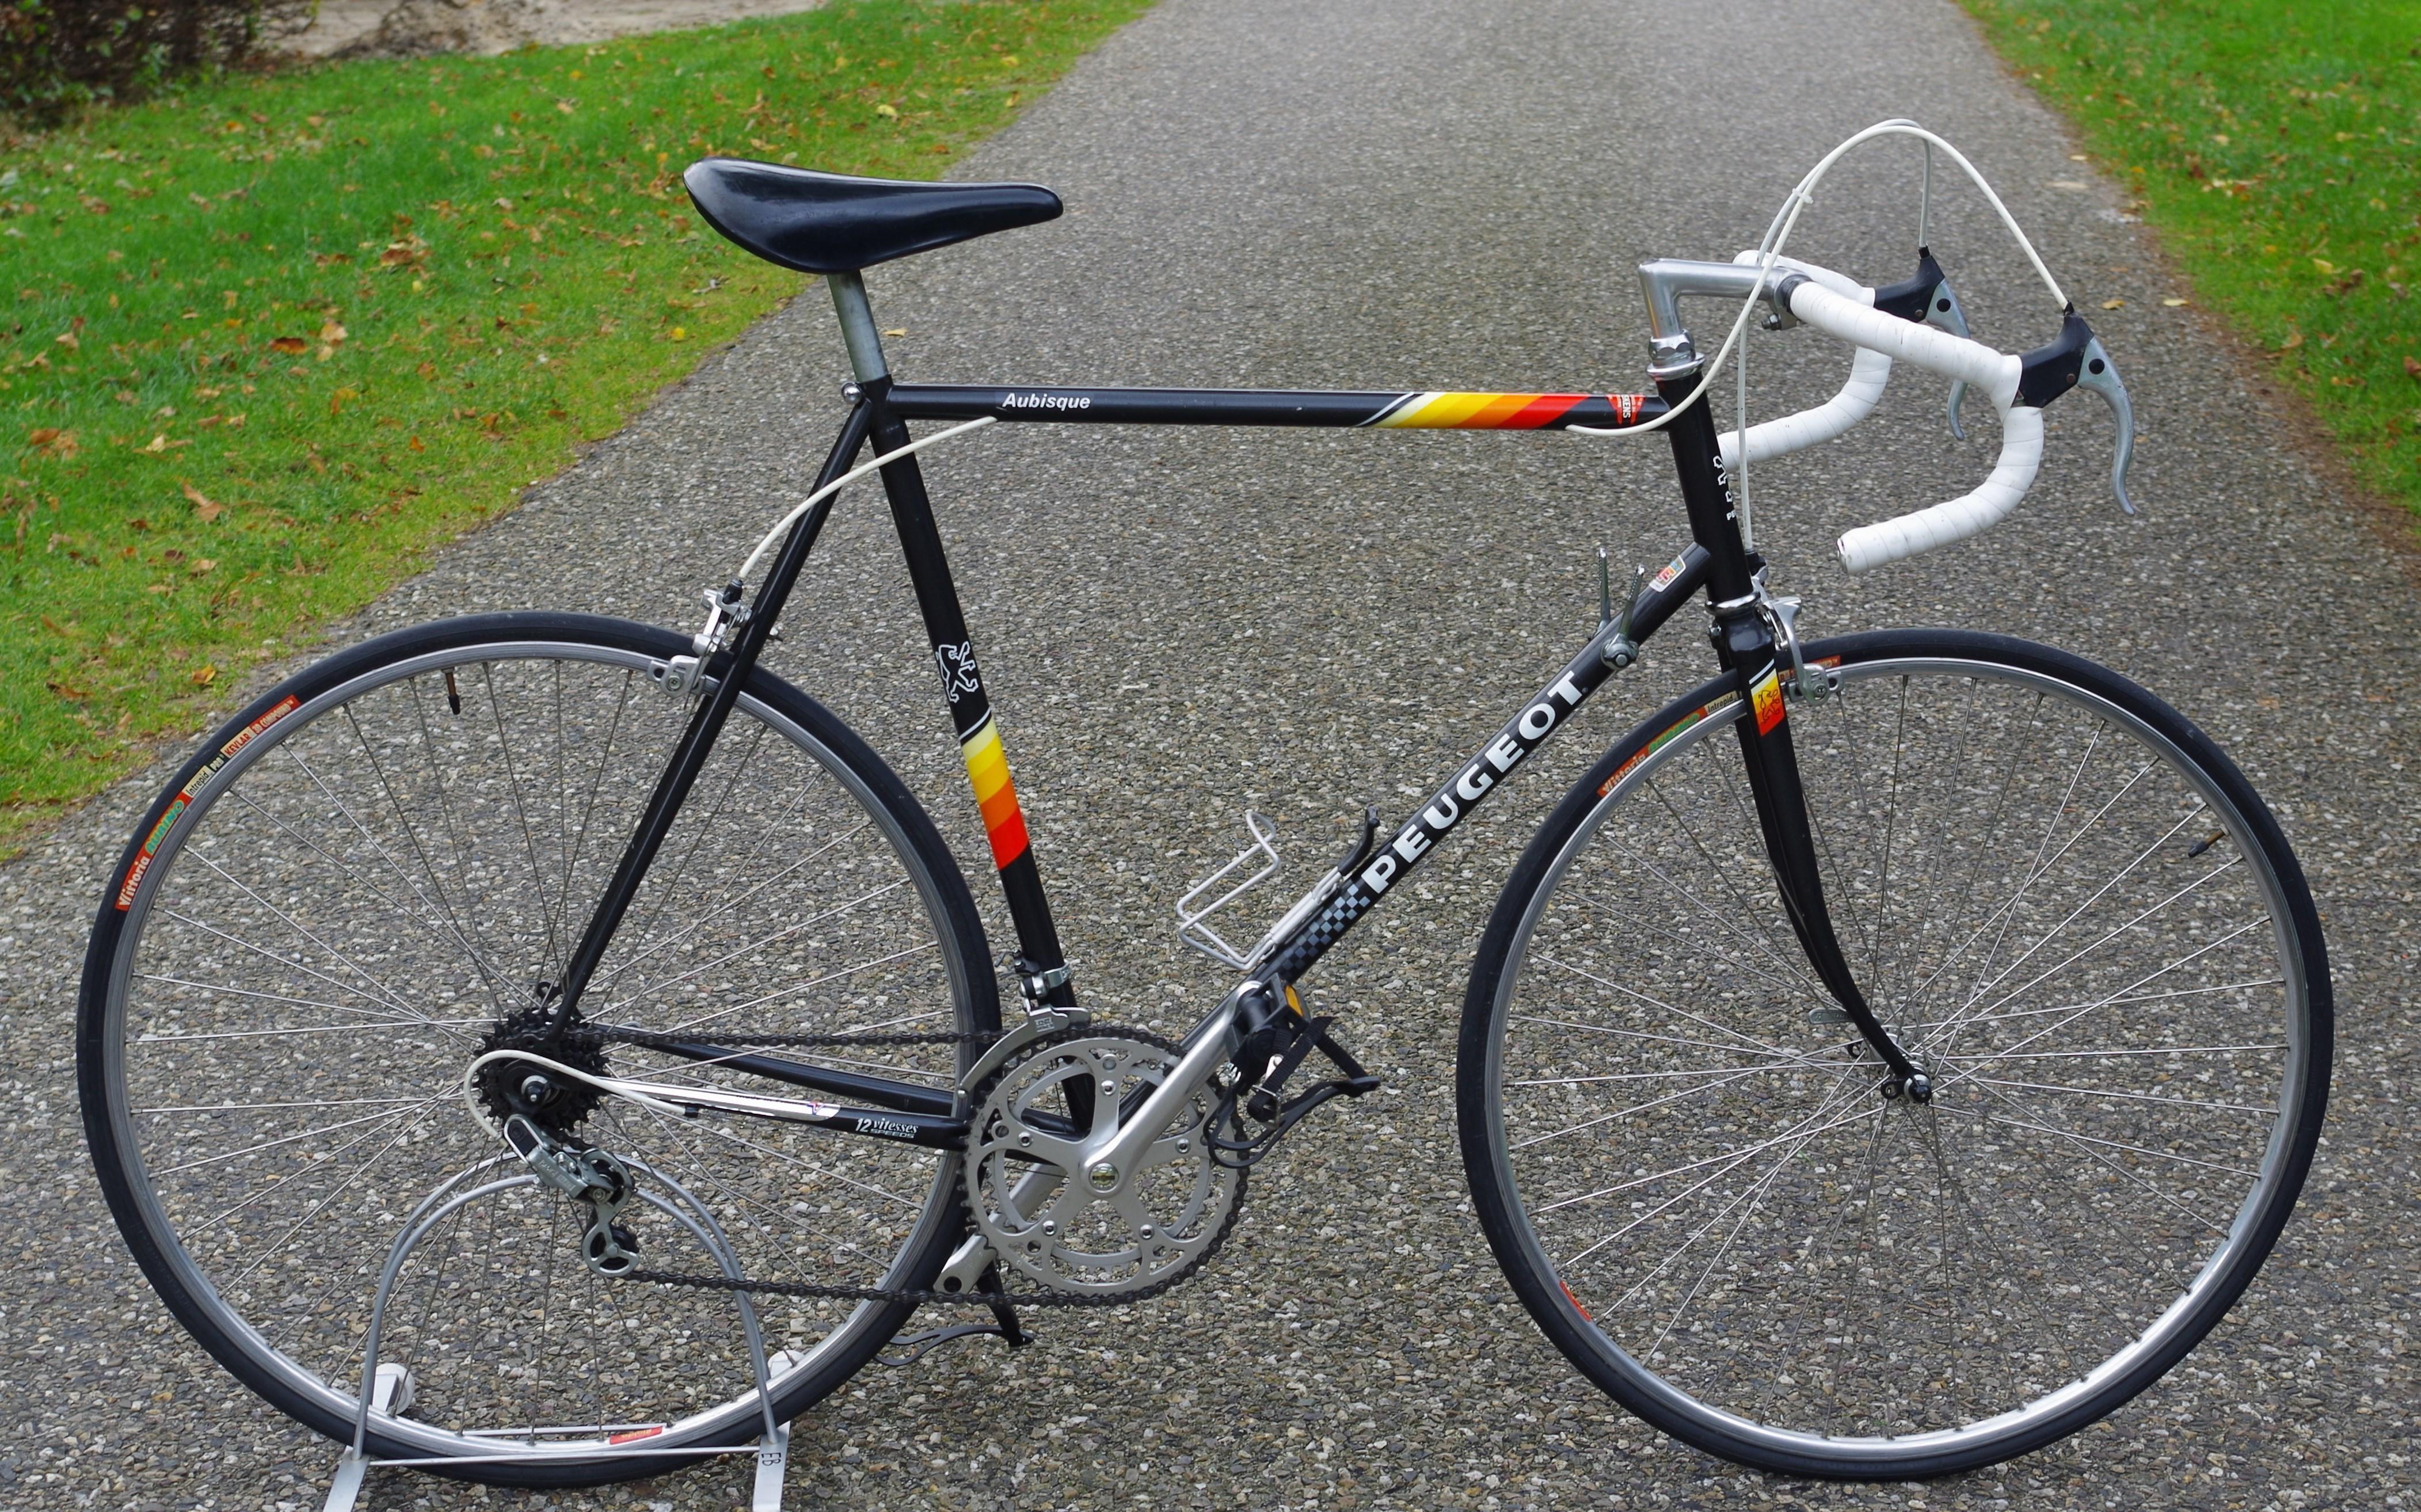 for sale: peugeot aubisque full bike 60x58cm =vgc= | lfgss | bike